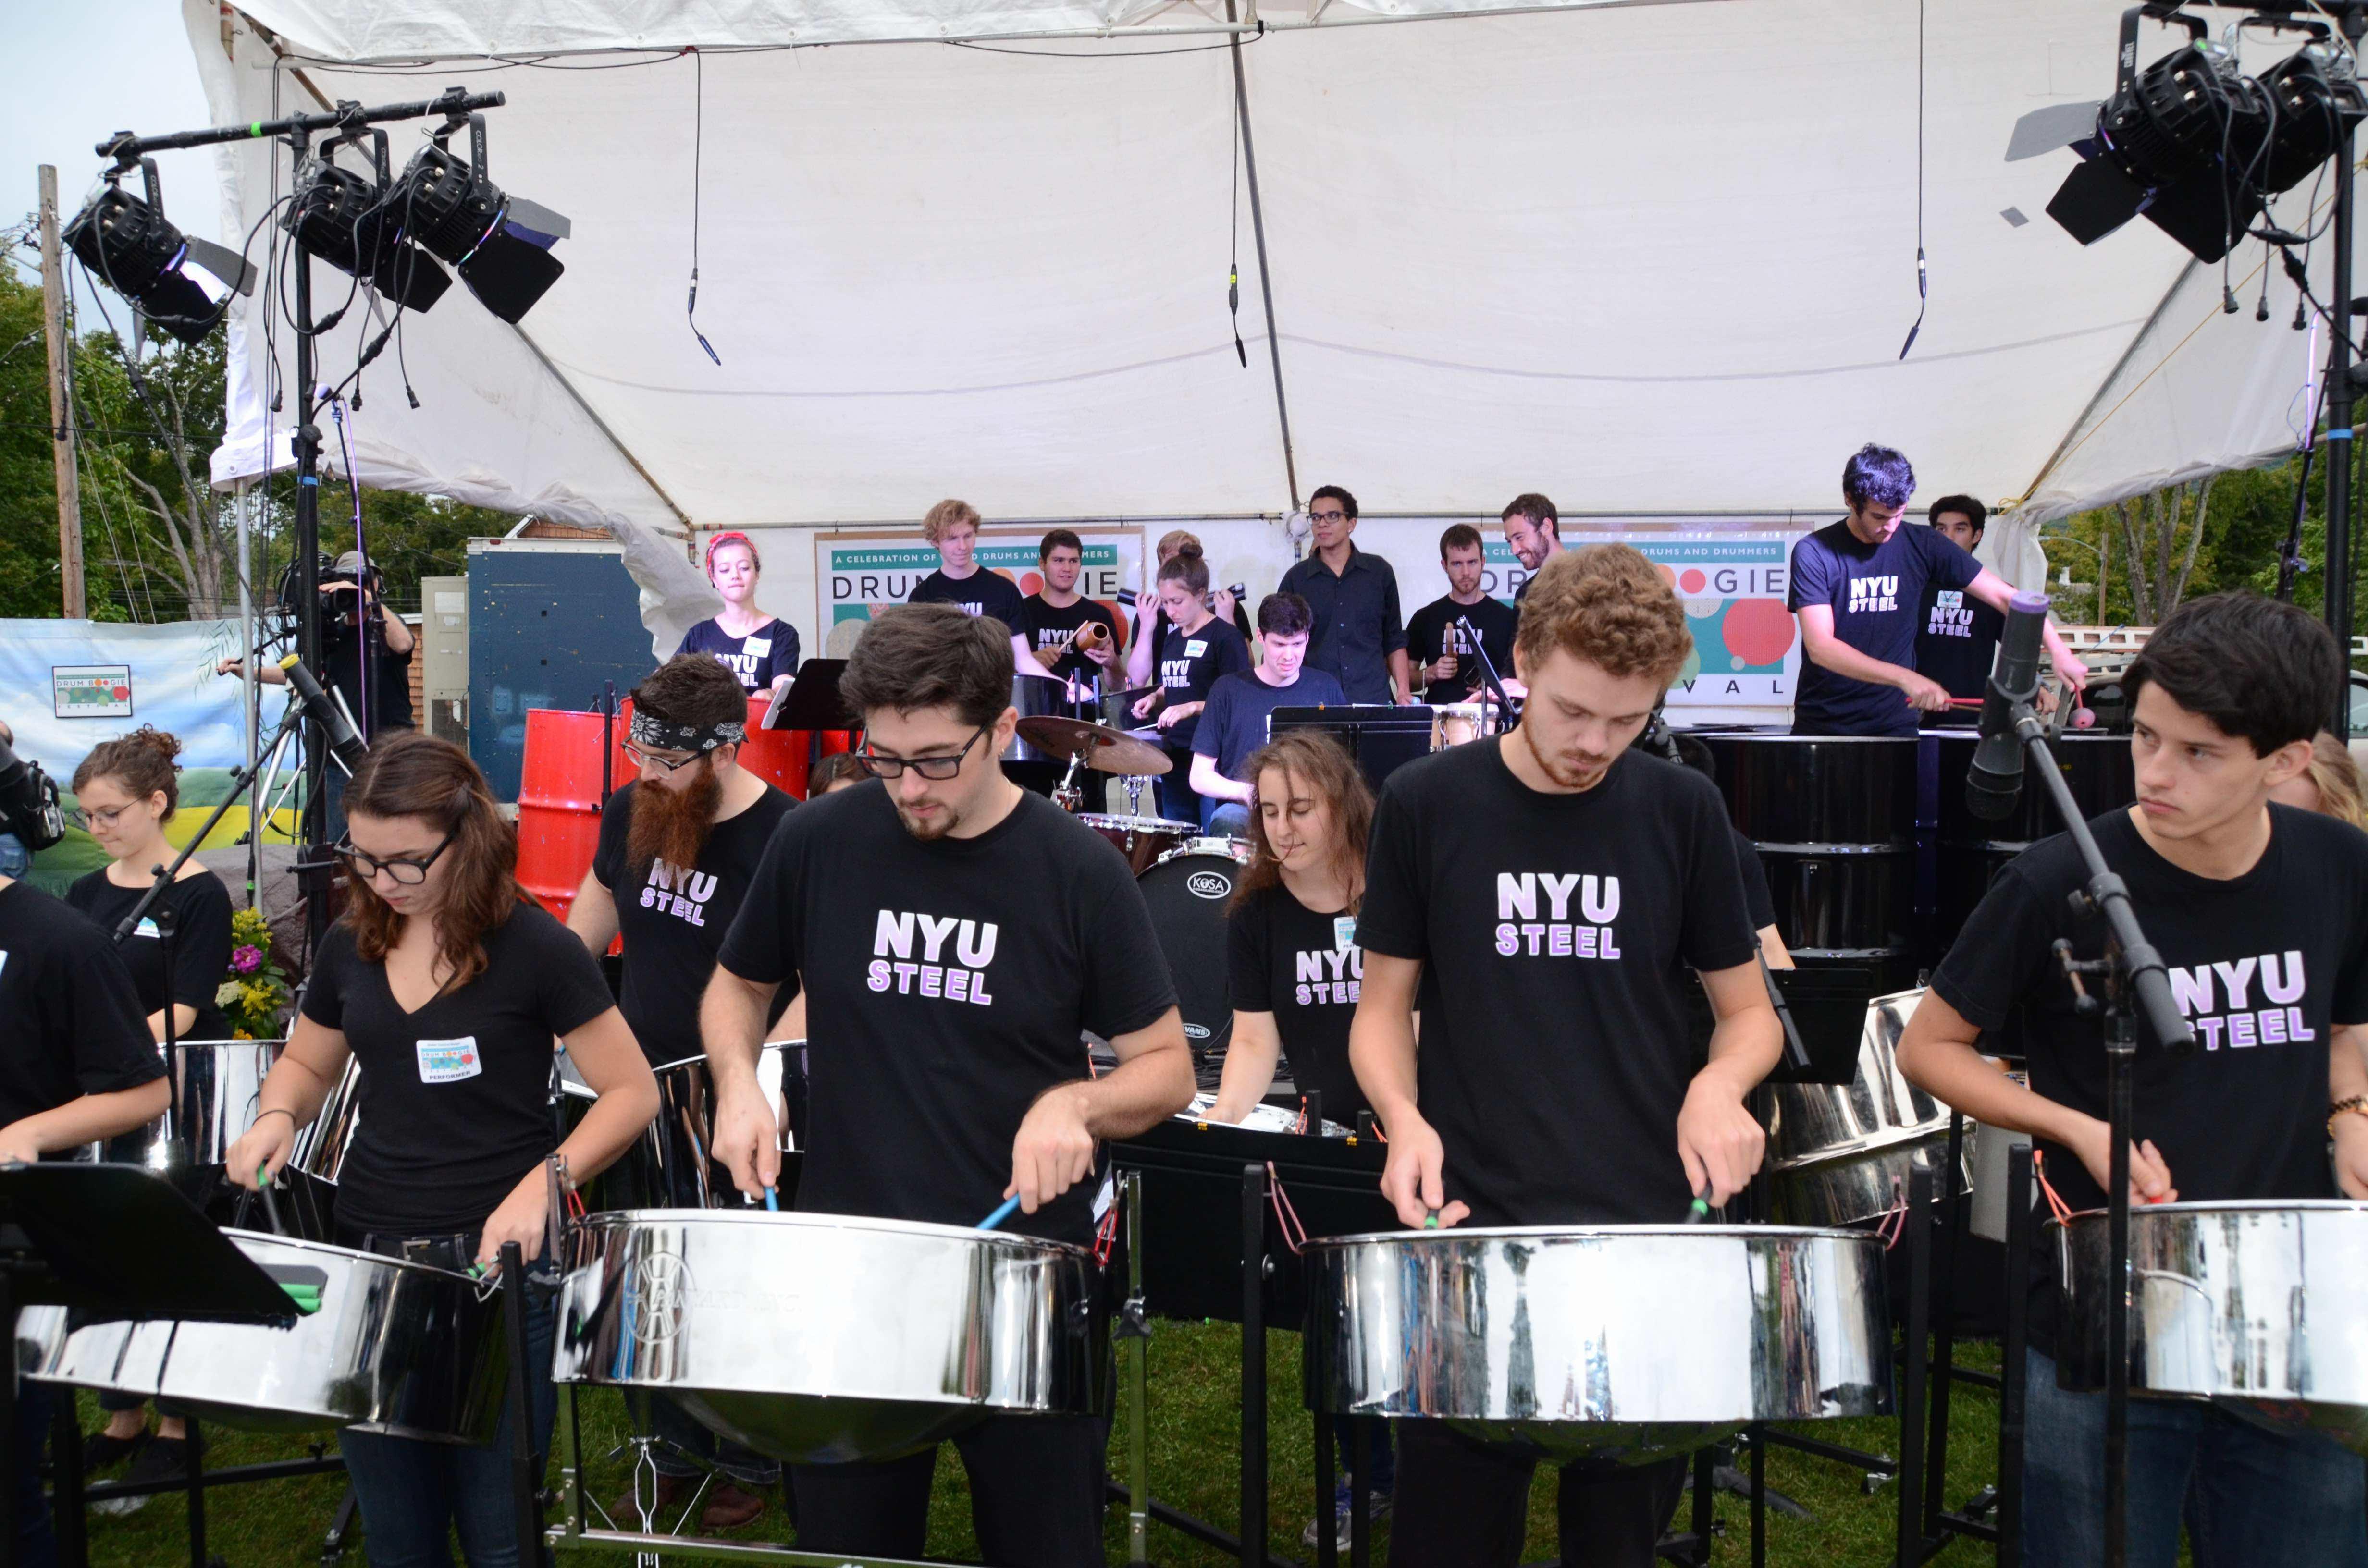 NYU steel drum boogie festival 2017